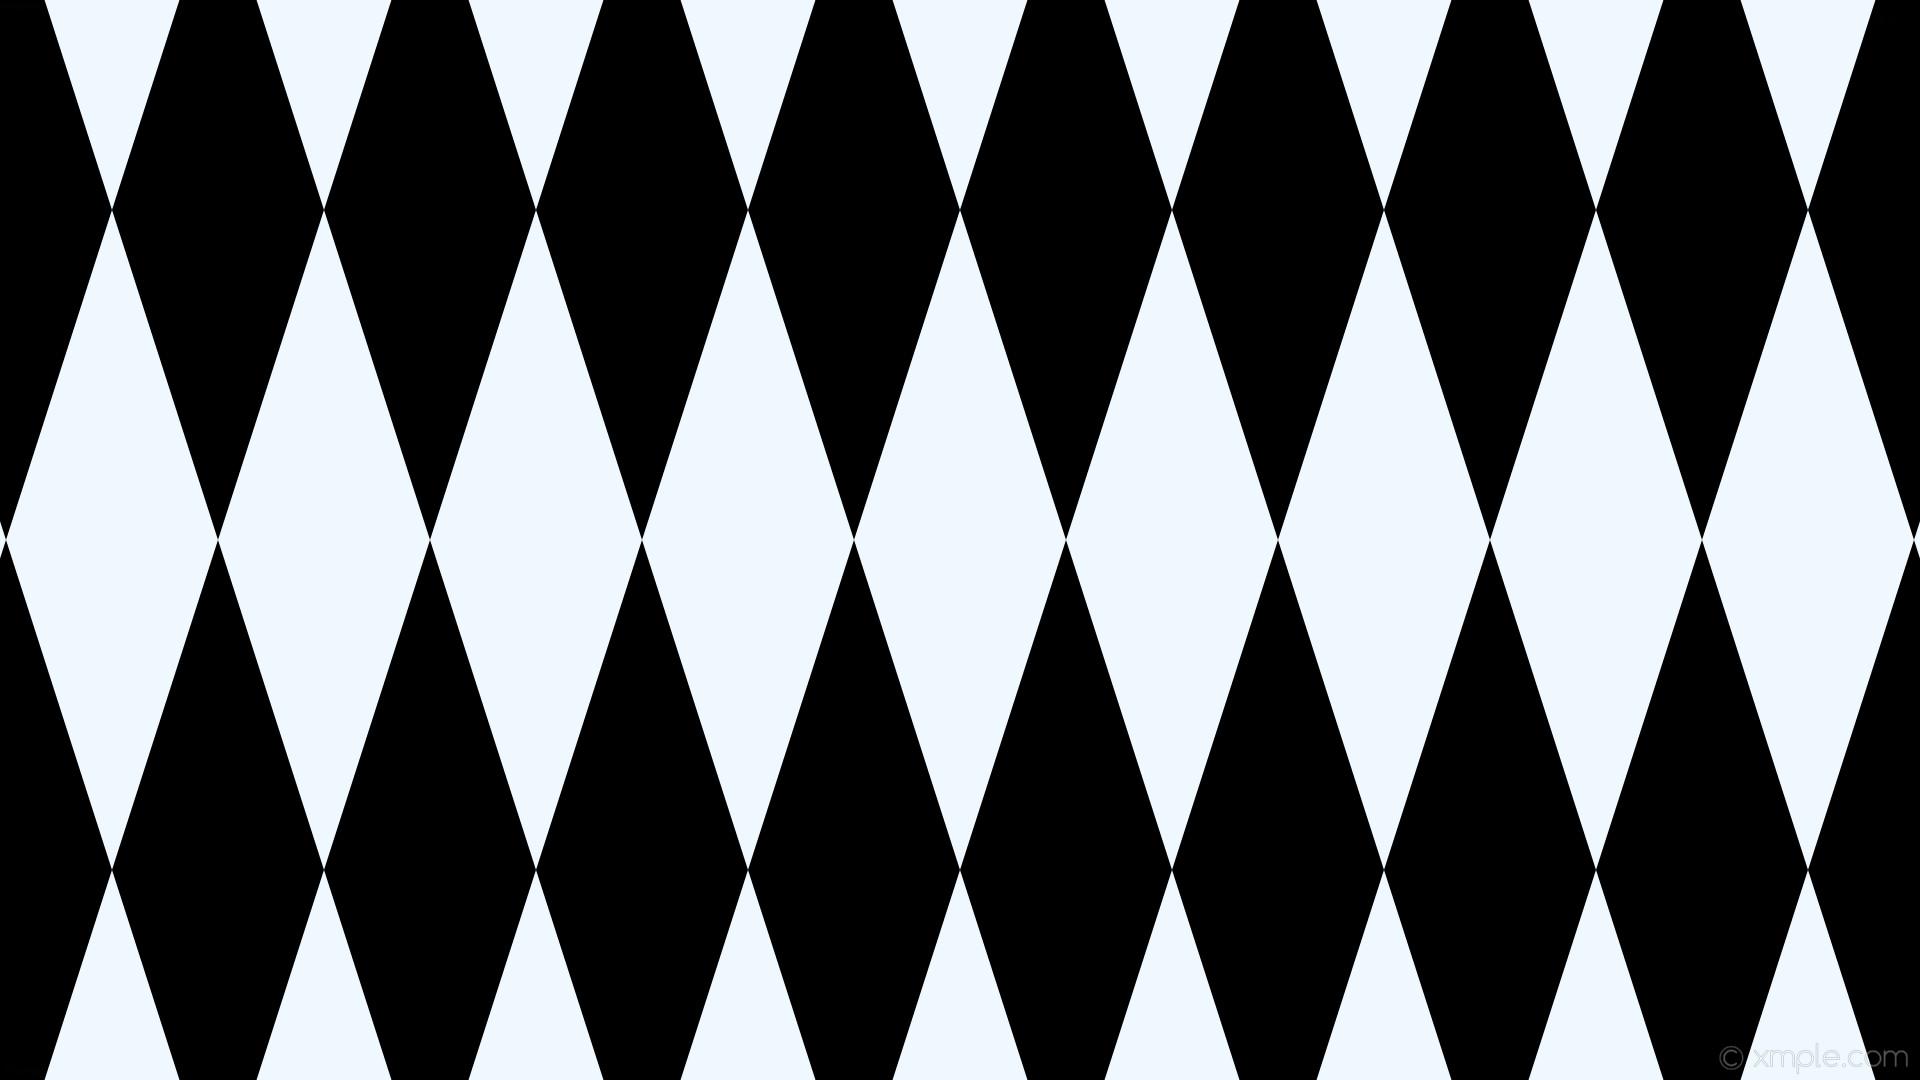 Res: 1920x1080, wallpaper black diamond white lozenge rhombus alice blue #f0f8ff #000000  90° 660px 212px